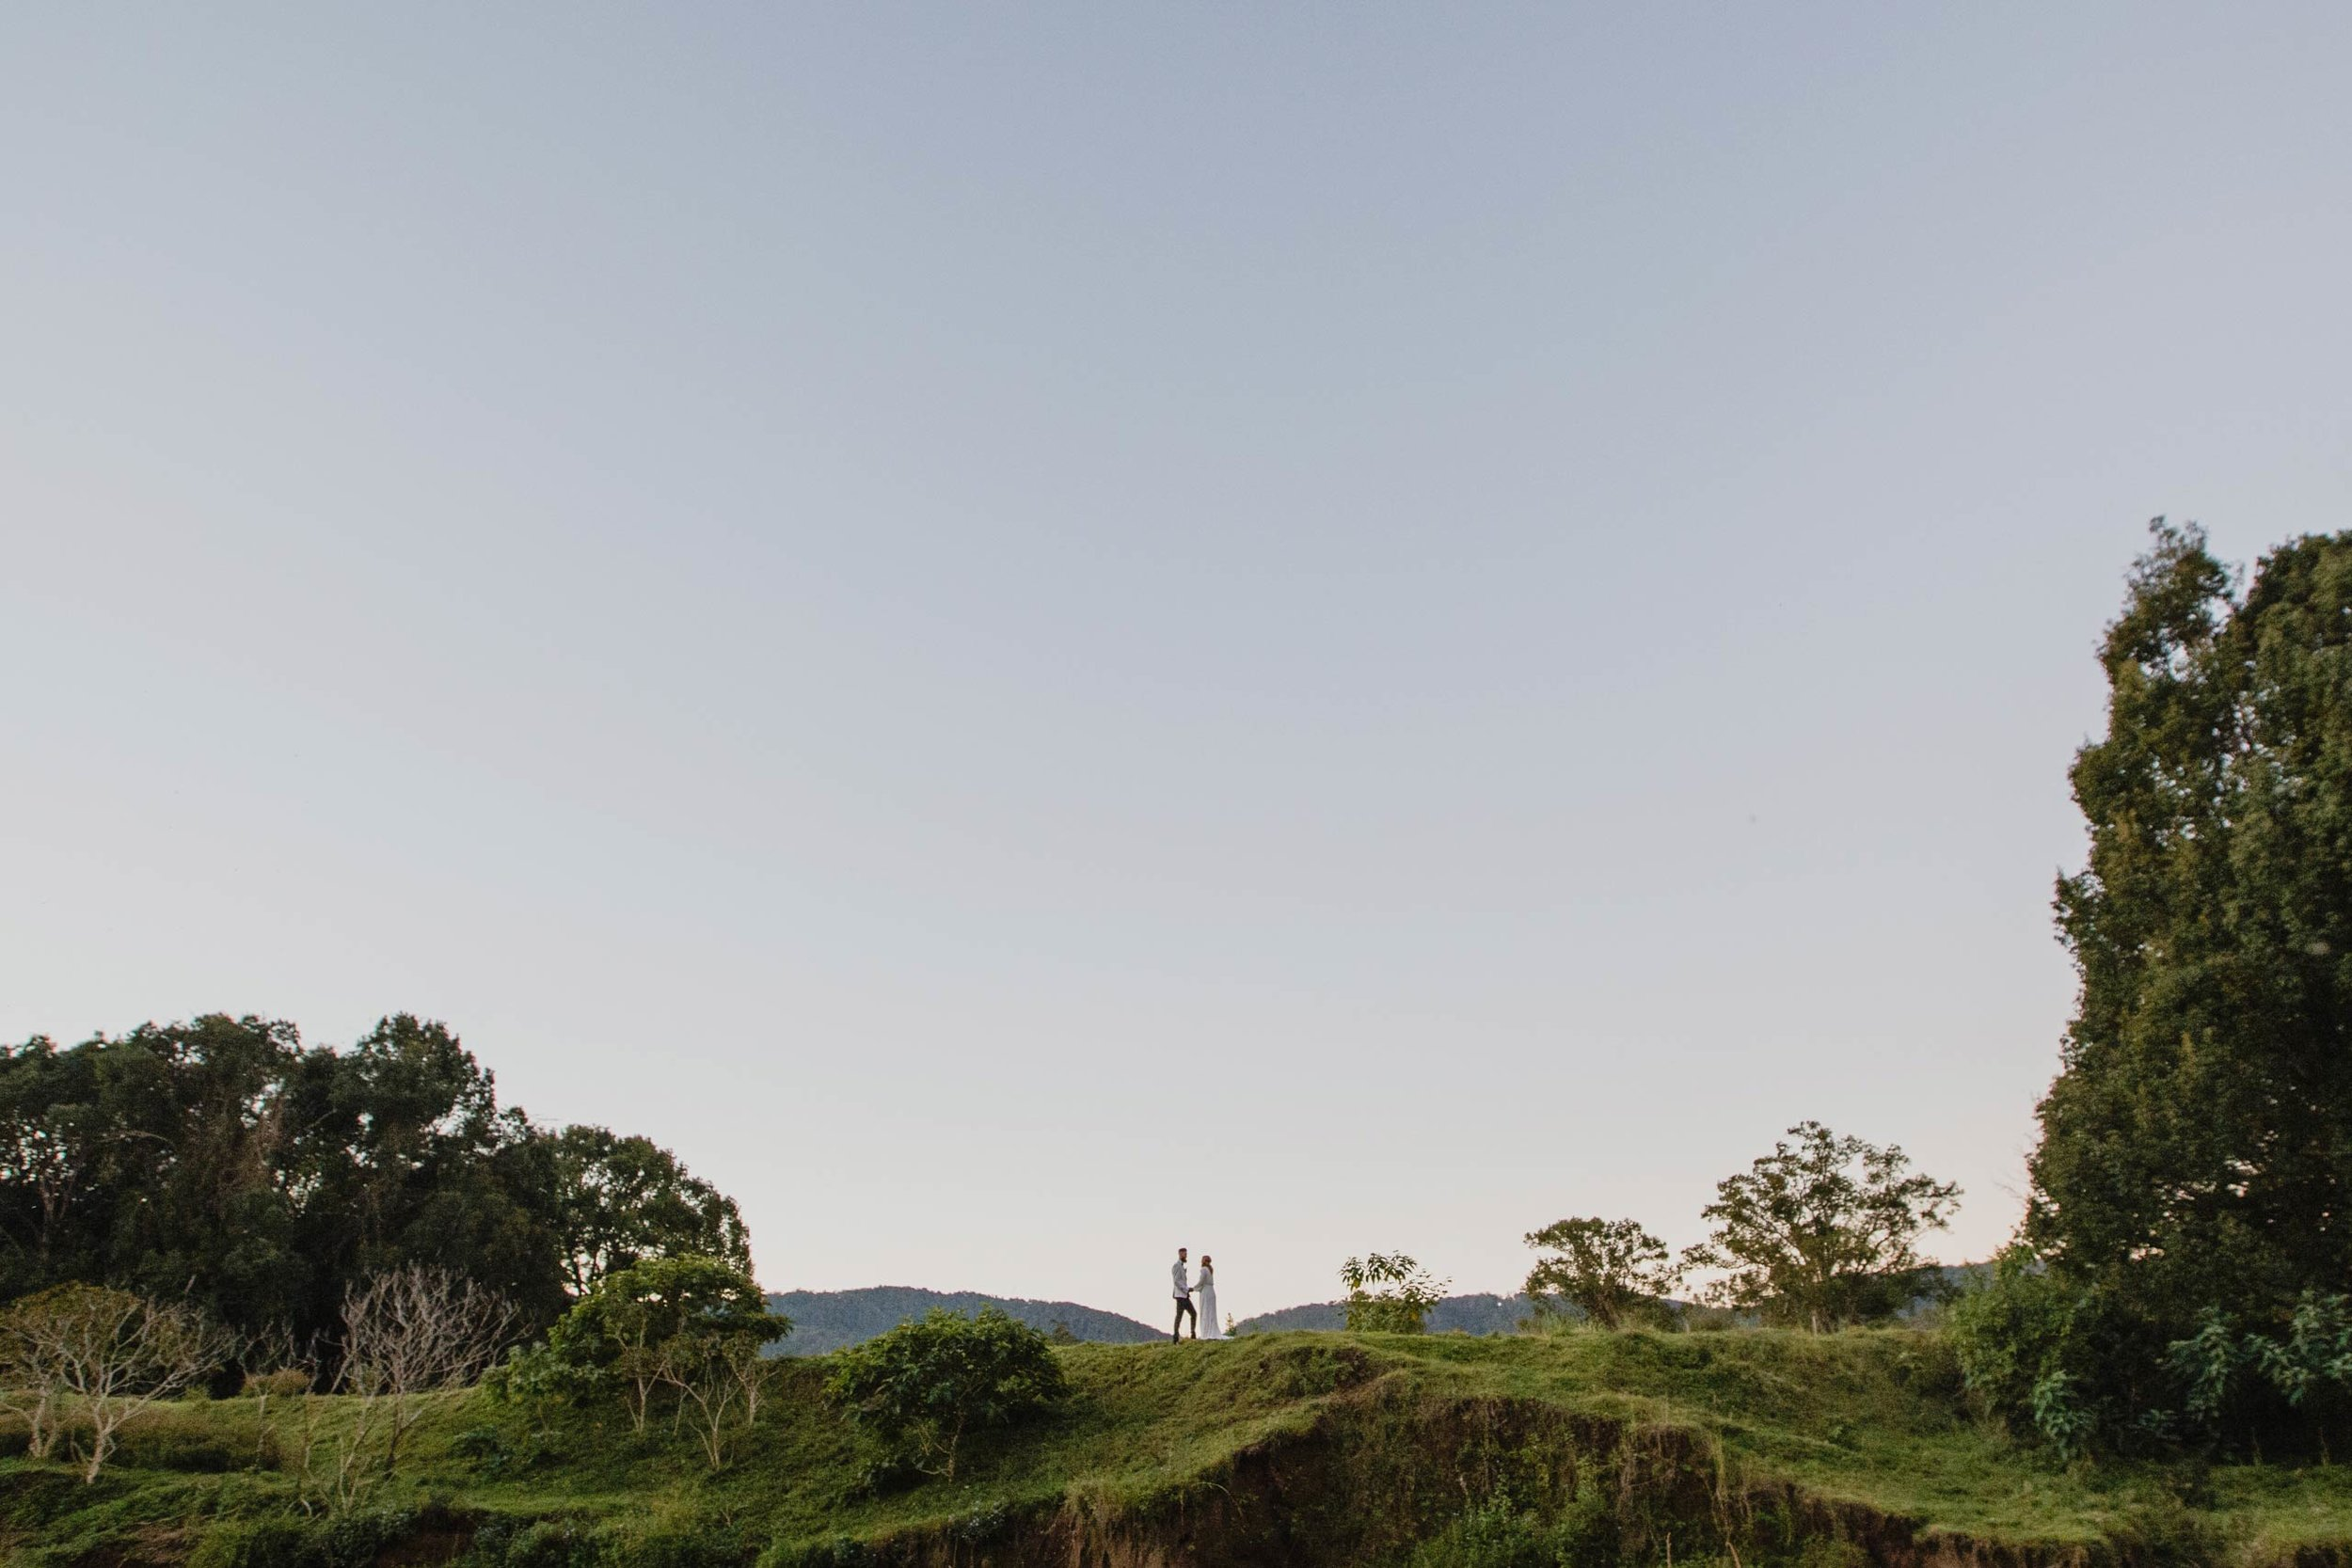 Maleny & Mapleton Destination Wedding Photographer - Top Sunshine Coast, Queensland, Australian Drone Wedding Photos